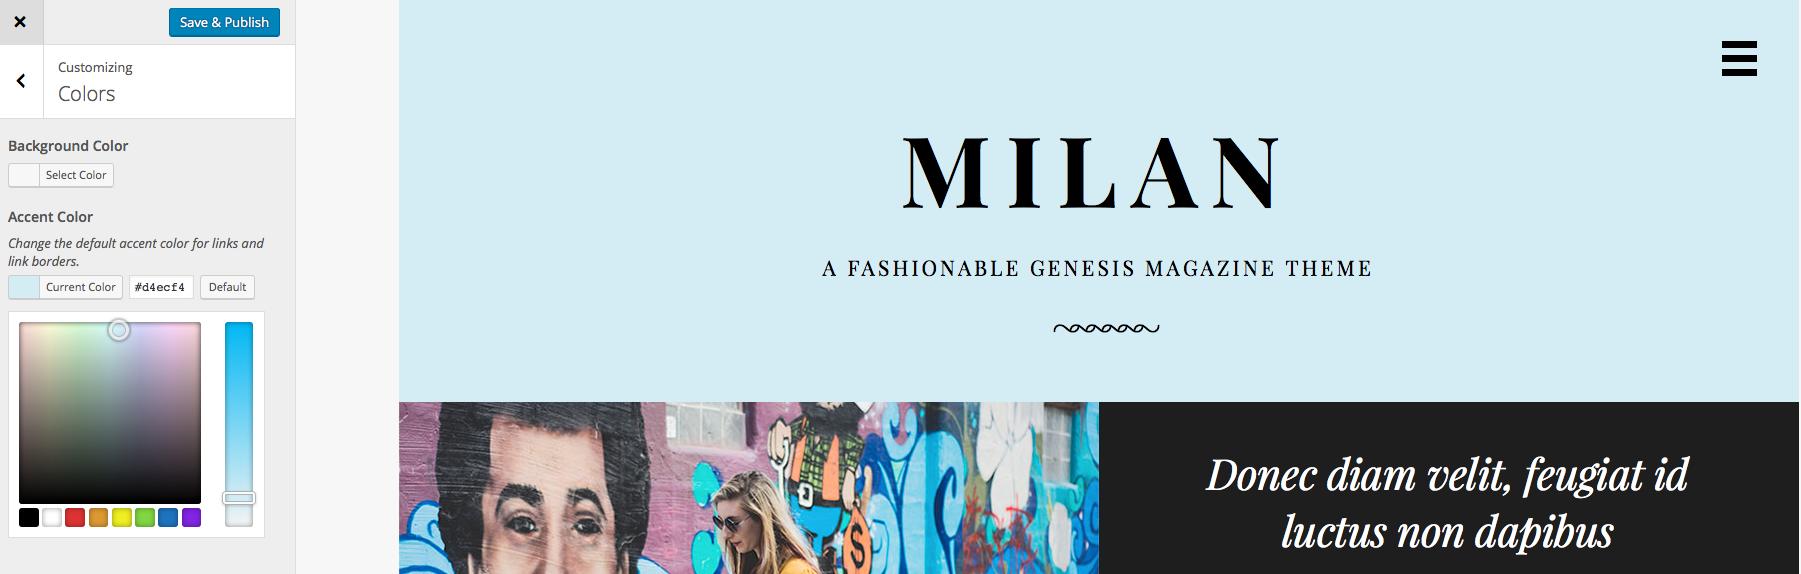 milan-accent-color